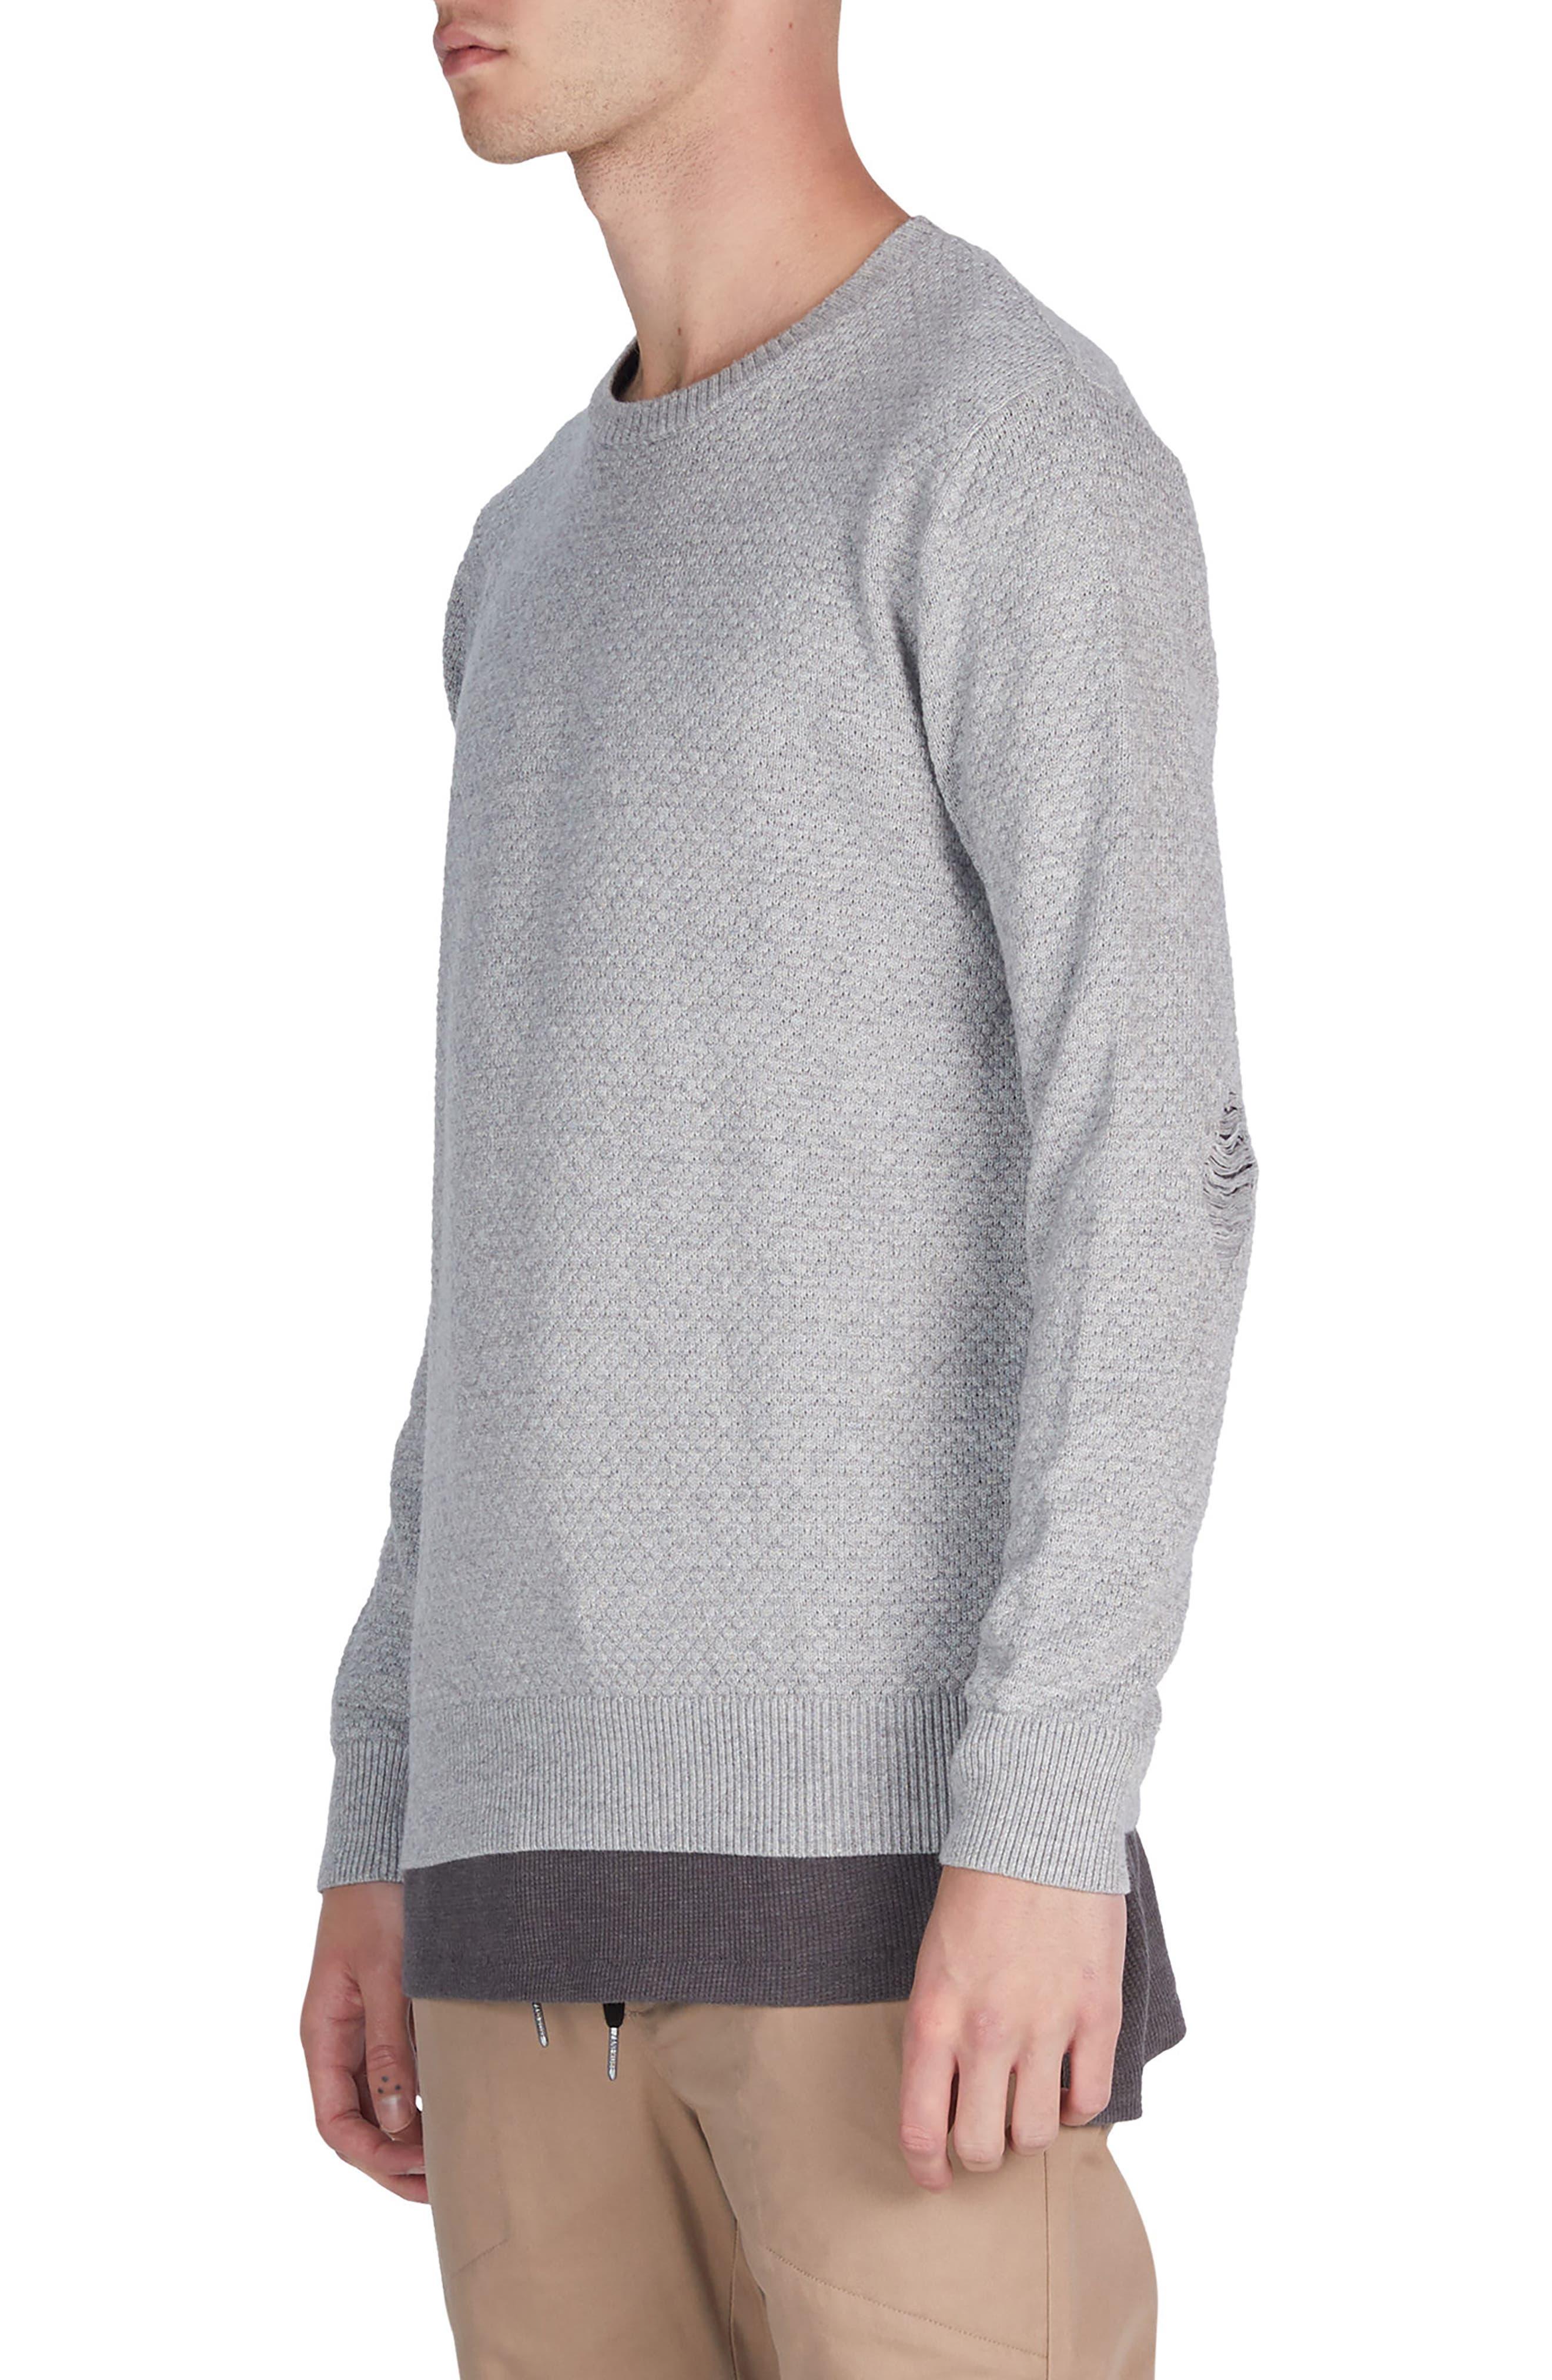 Grip Crewneck Sweater,                             Alternate thumbnail 4, color,                             Grey Marle